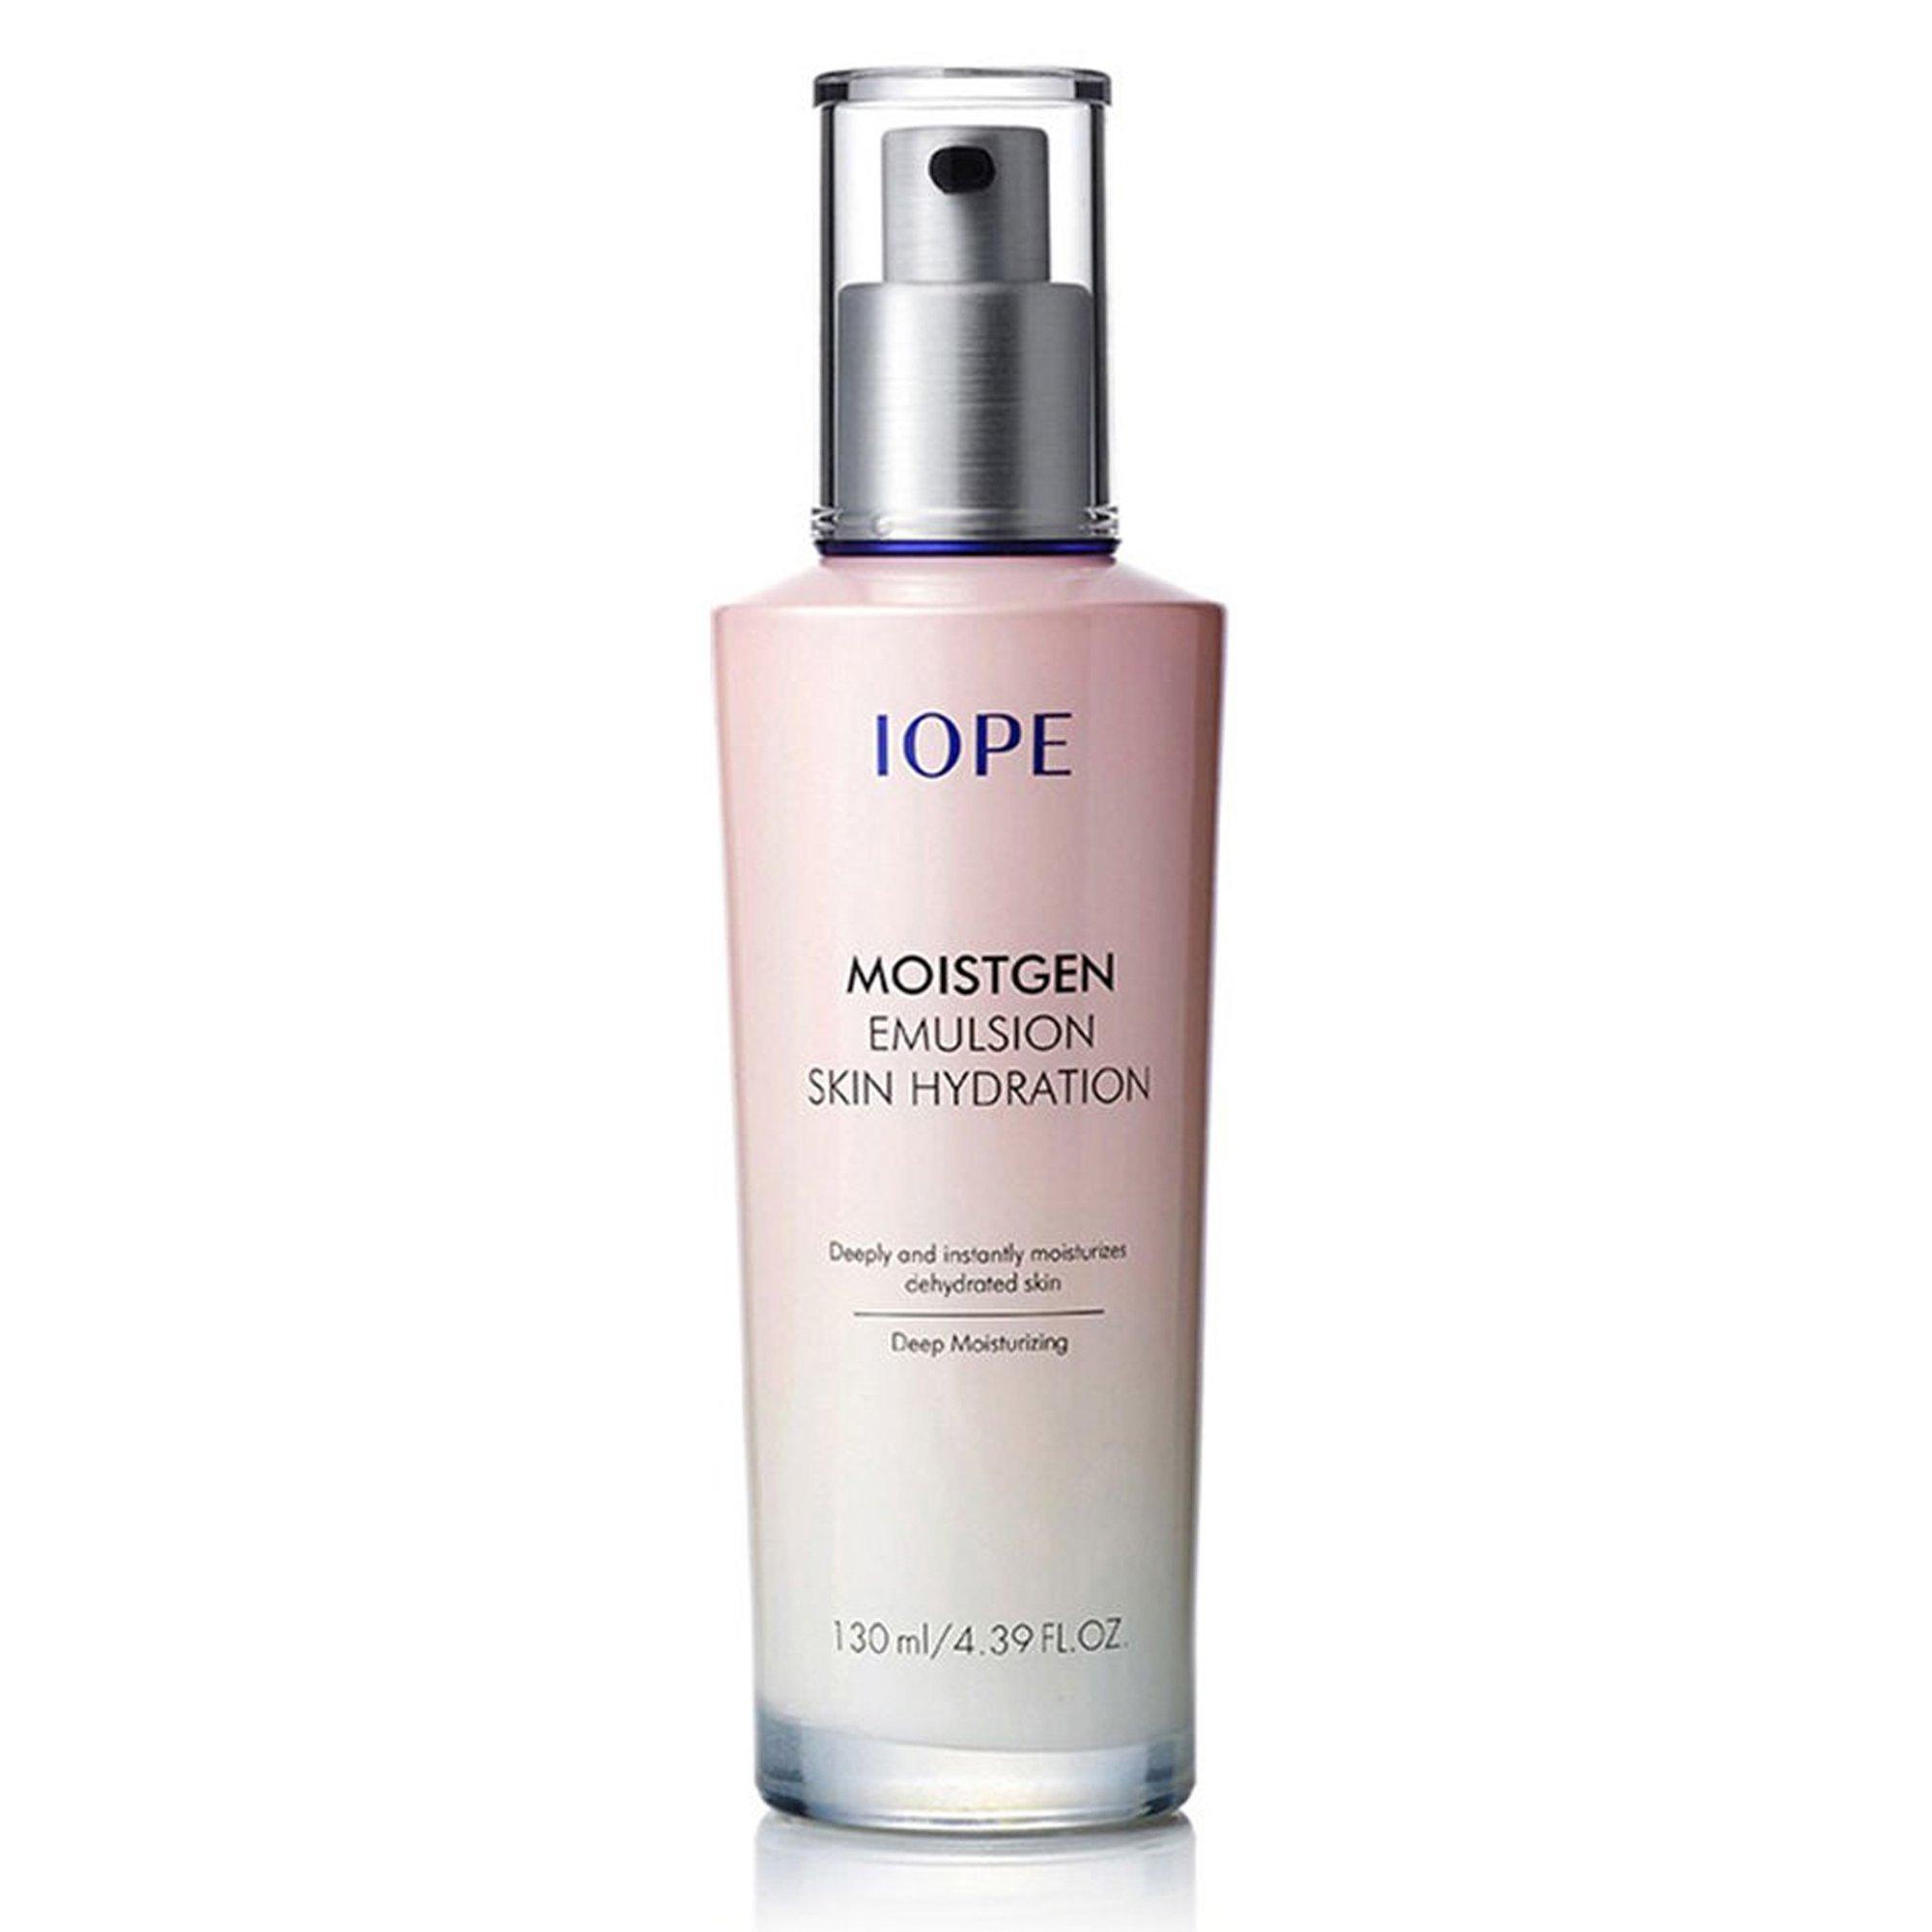 IOPE Moistgen Emulsion Skin Hydration